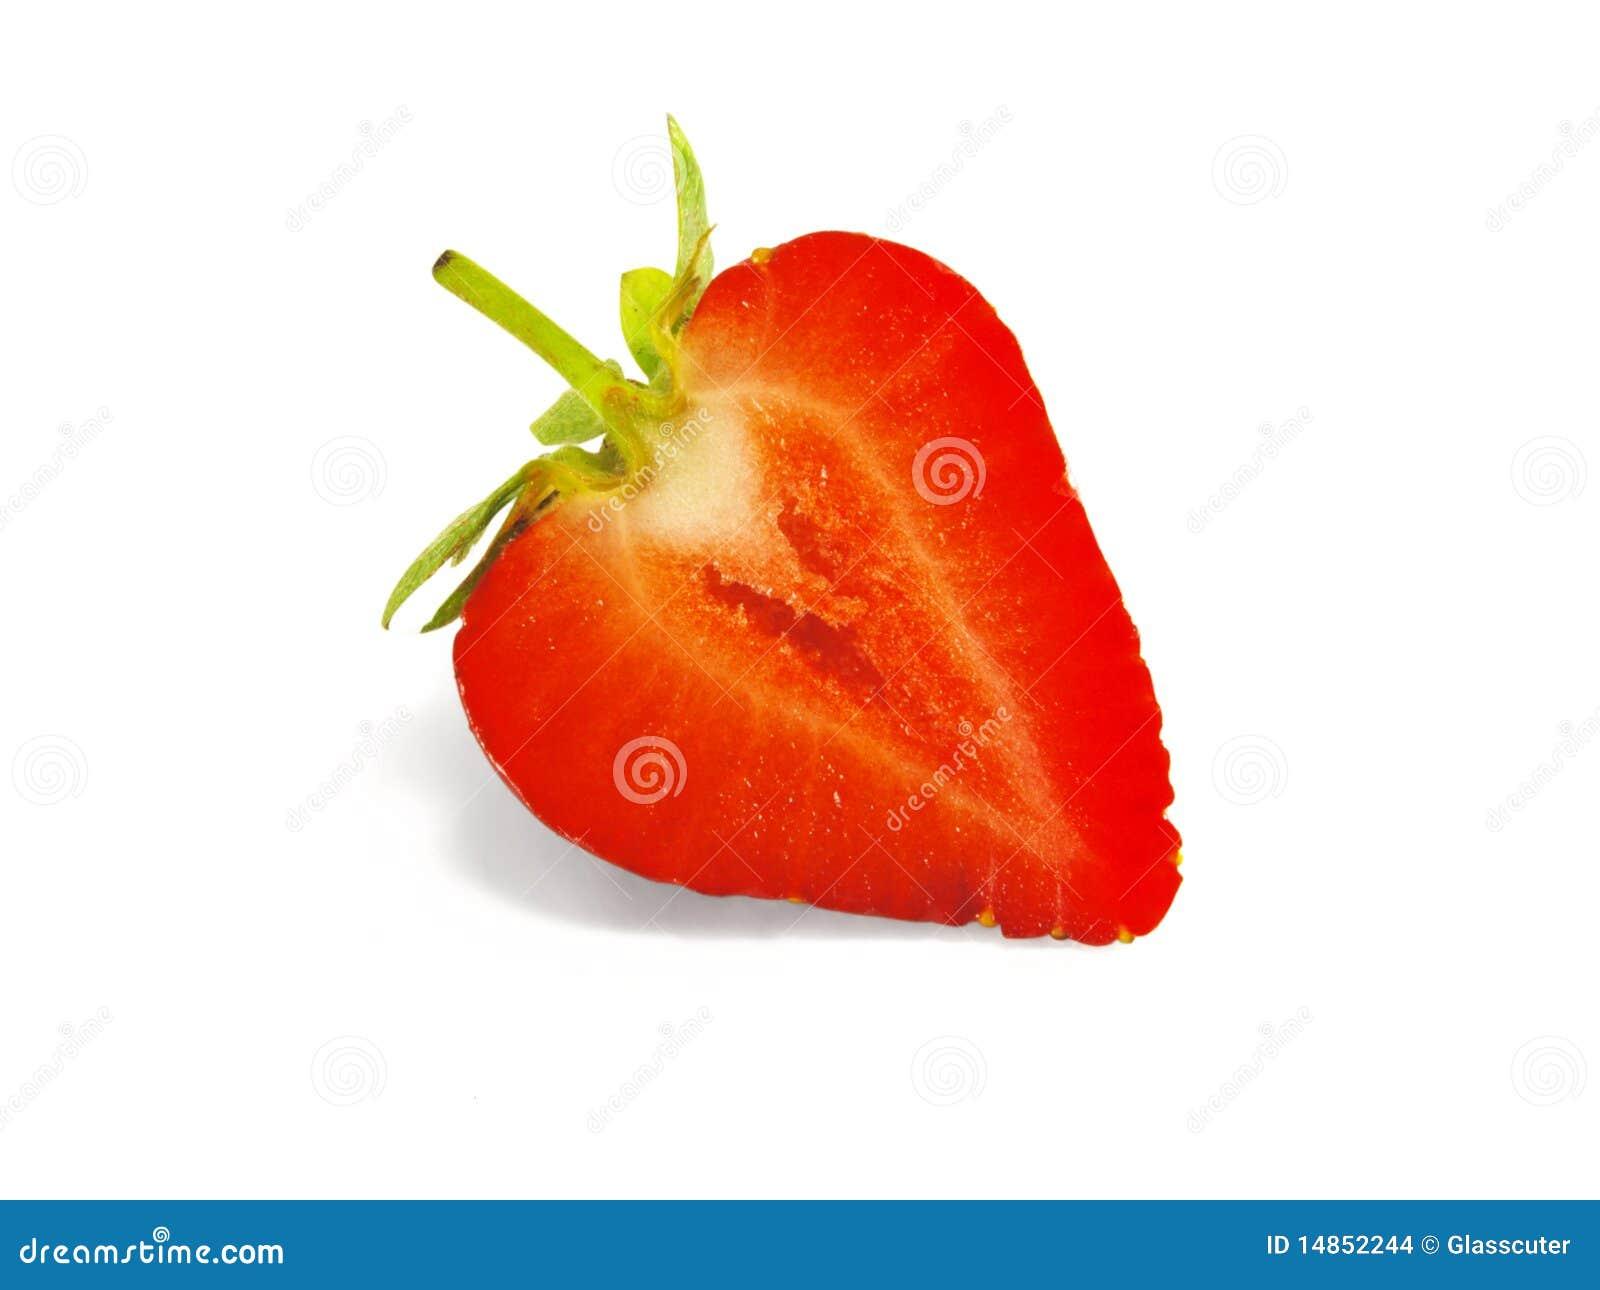 Strawberries cut